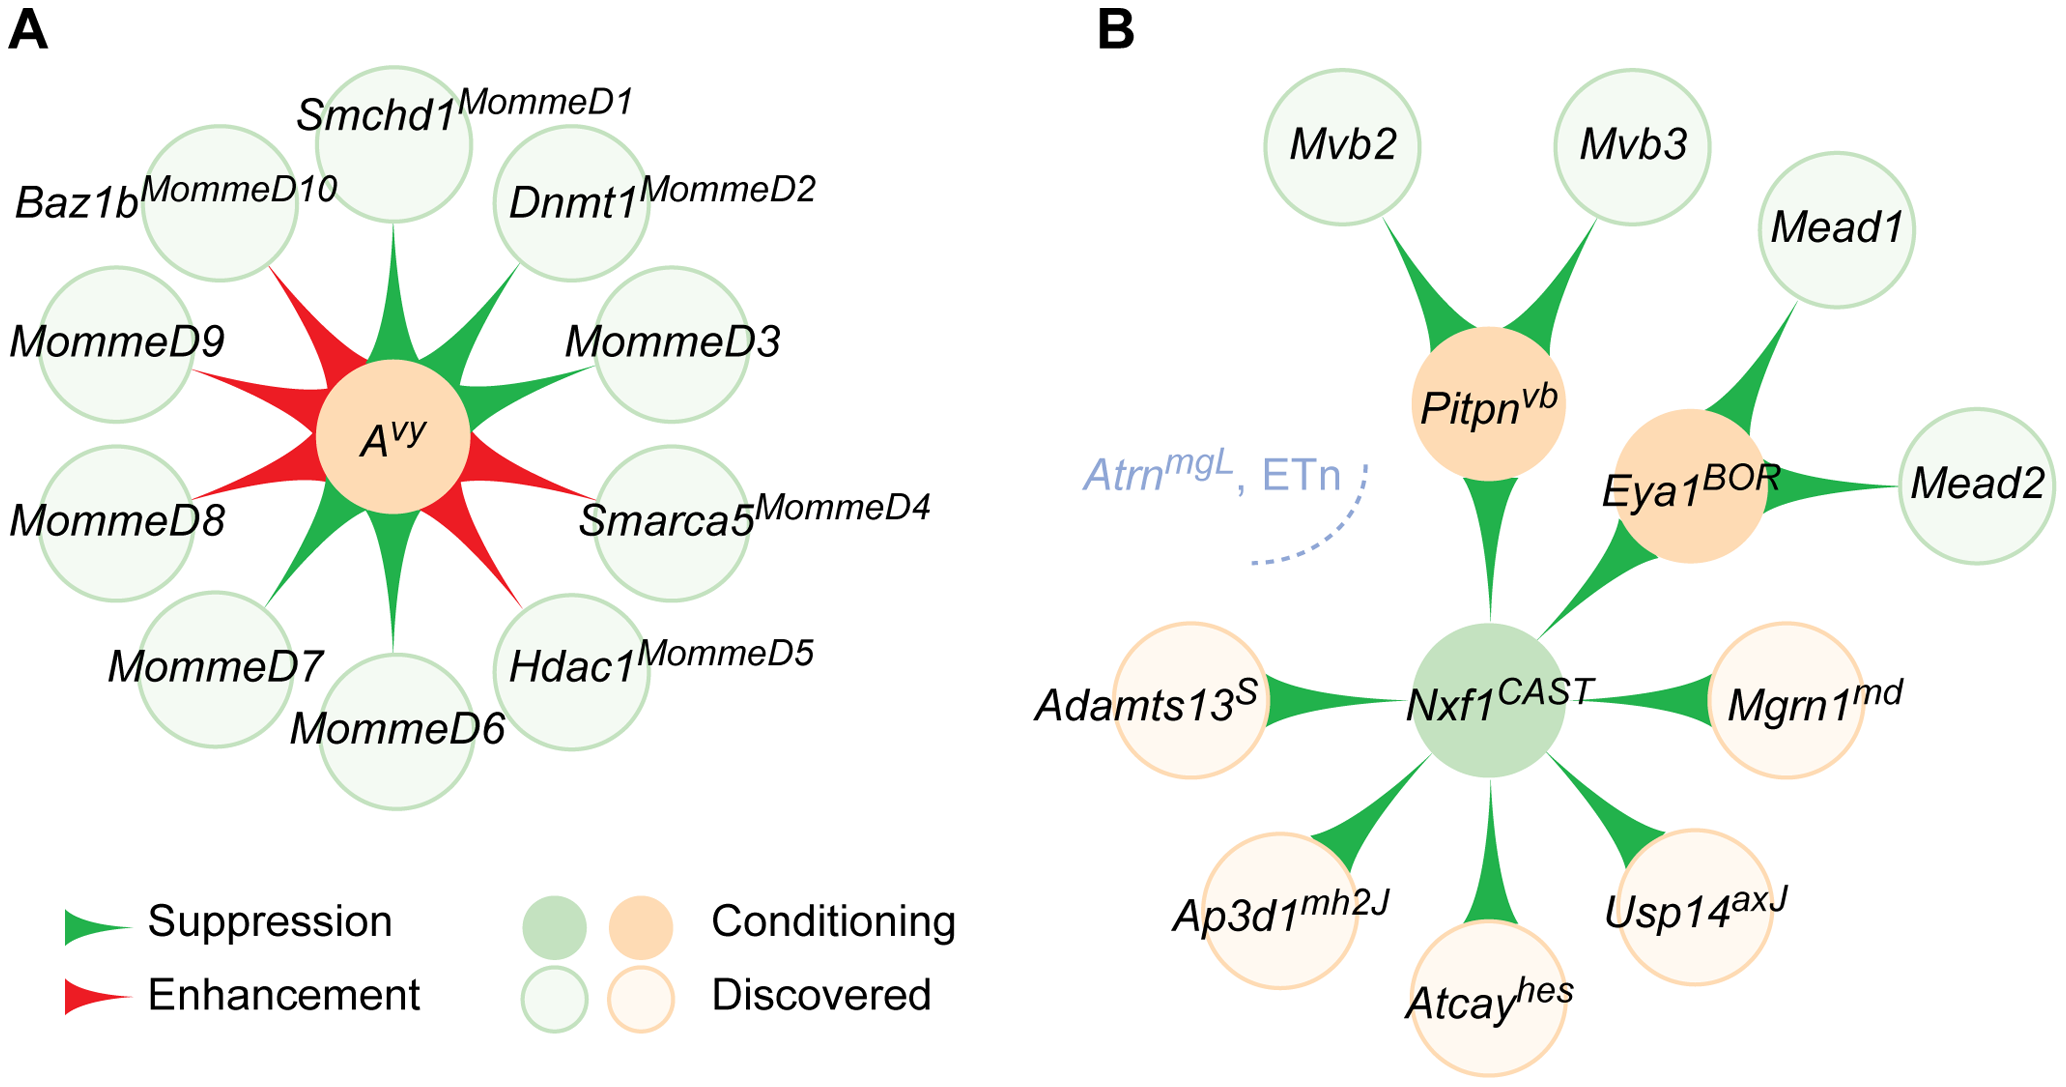 Modifier gene networks have directional edges between nodes.